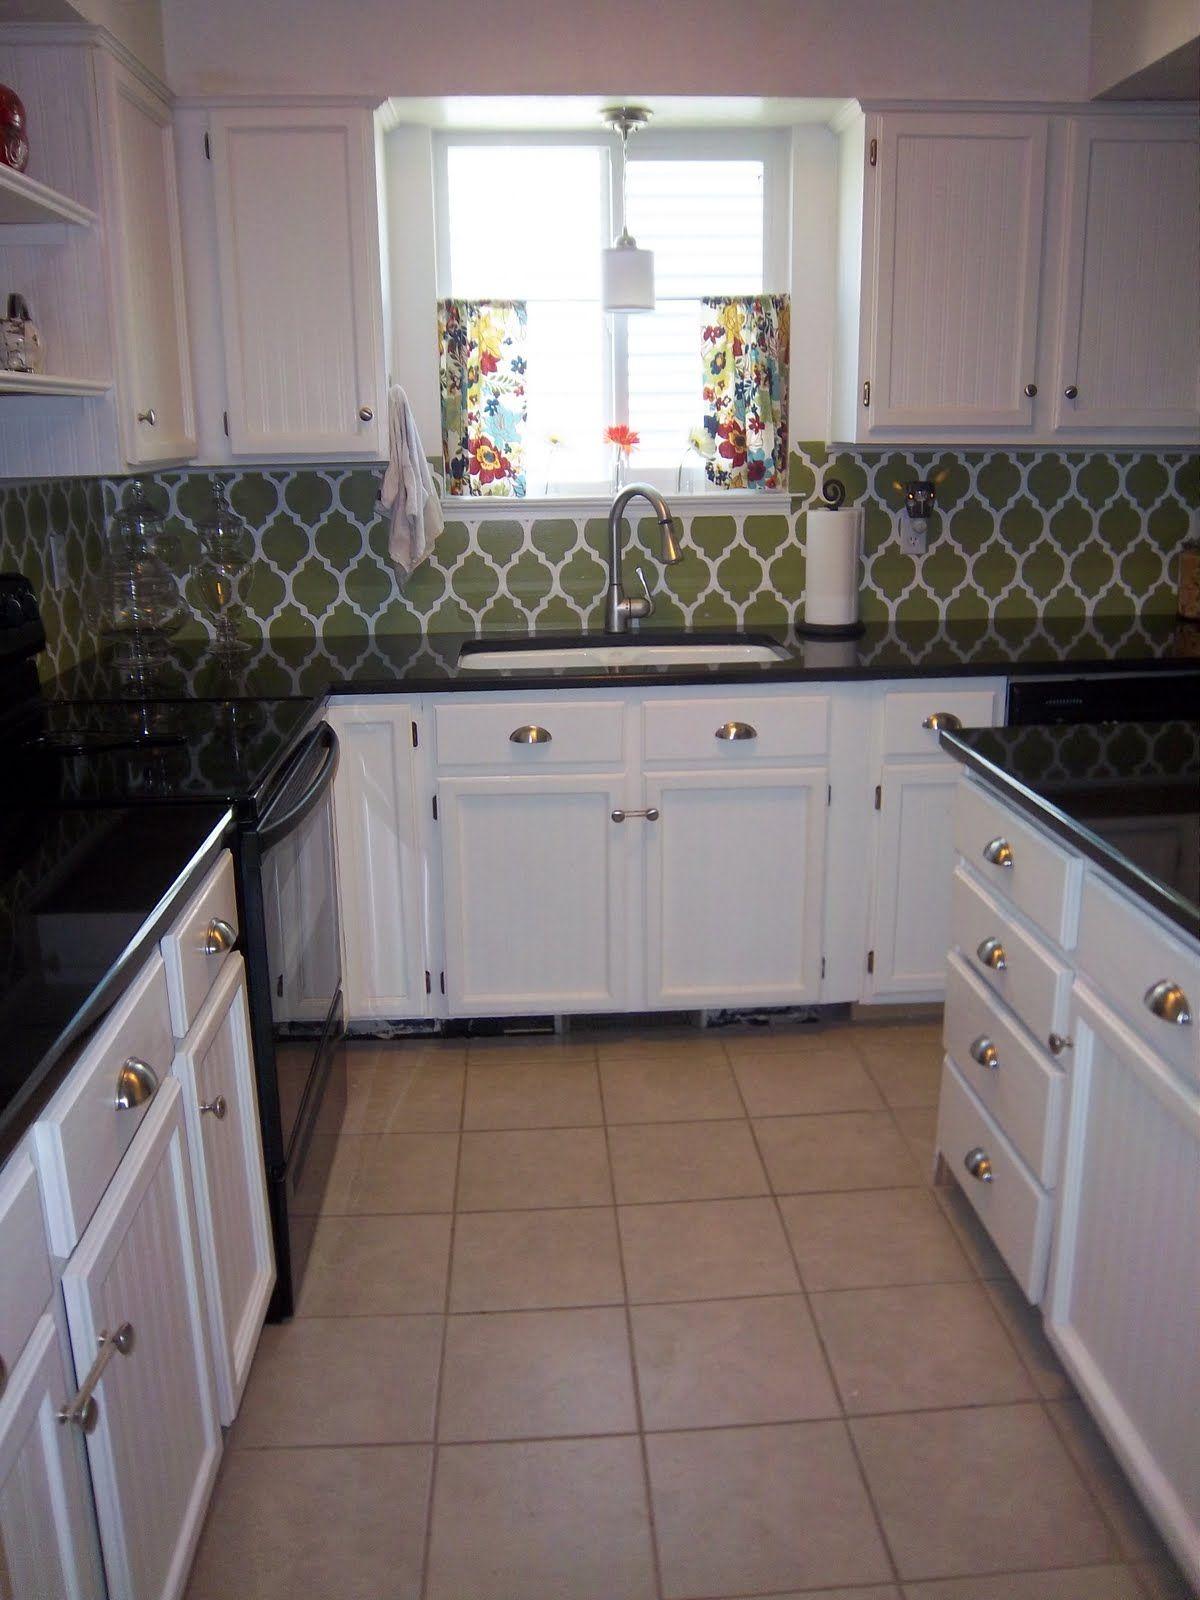 like the backsplash it 39 s stenciled easy n cheap way to do the backsplash kitchen upgrades. Black Bedroom Furniture Sets. Home Design Ideas